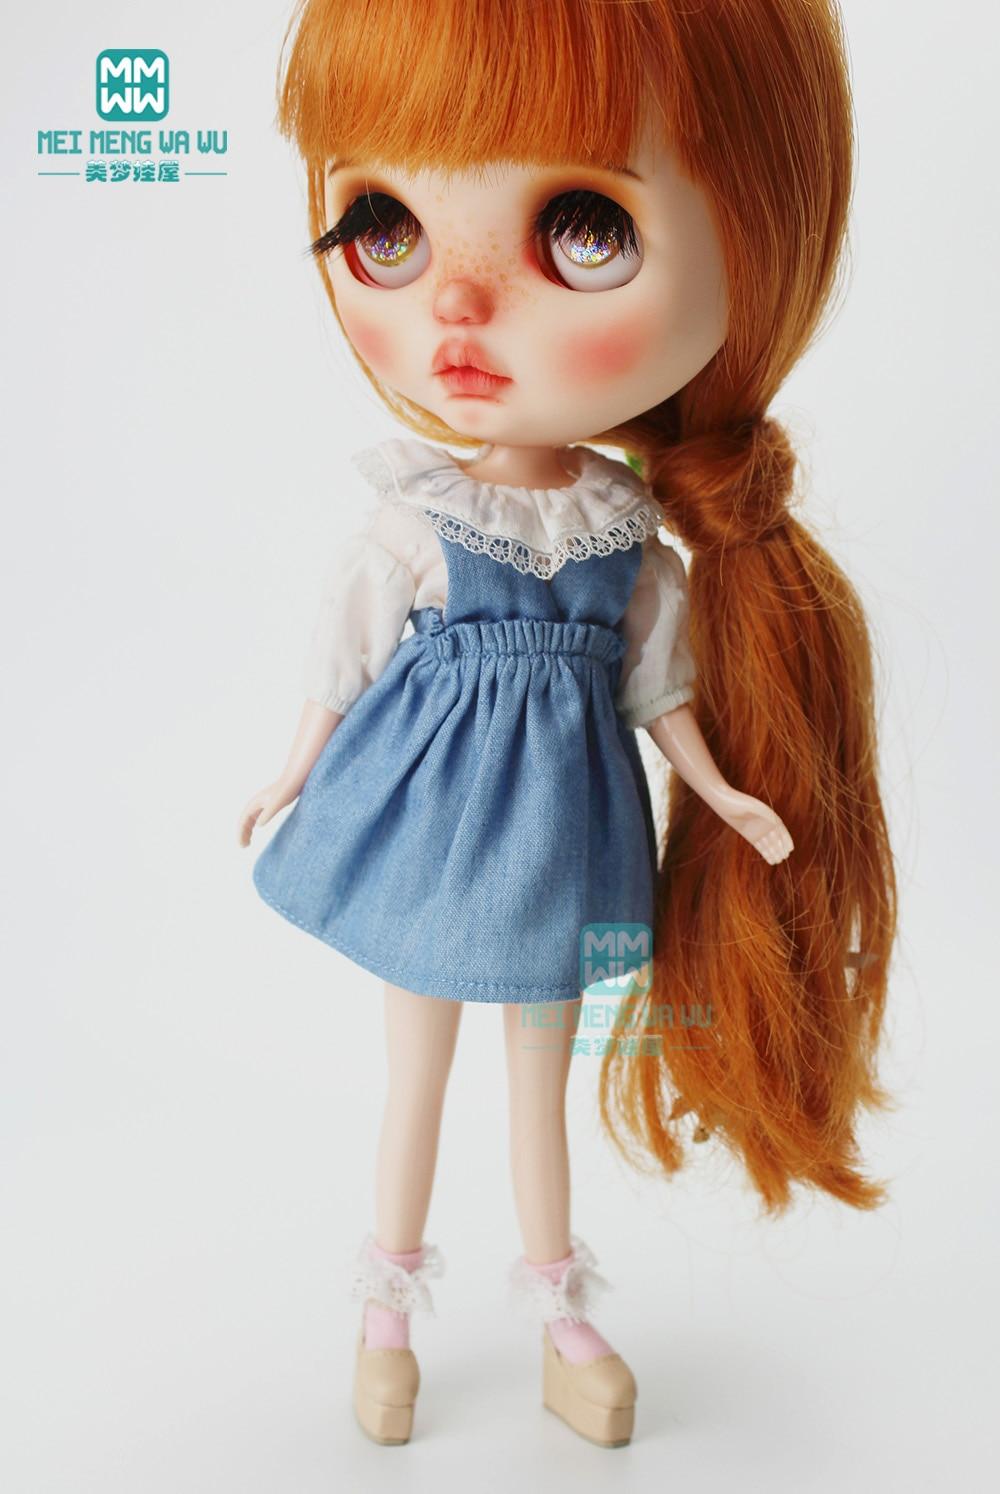 1PCS Blyth accessories fashion lantern shirt, denim dress for Blyth  Azone 1/6 doll clothes